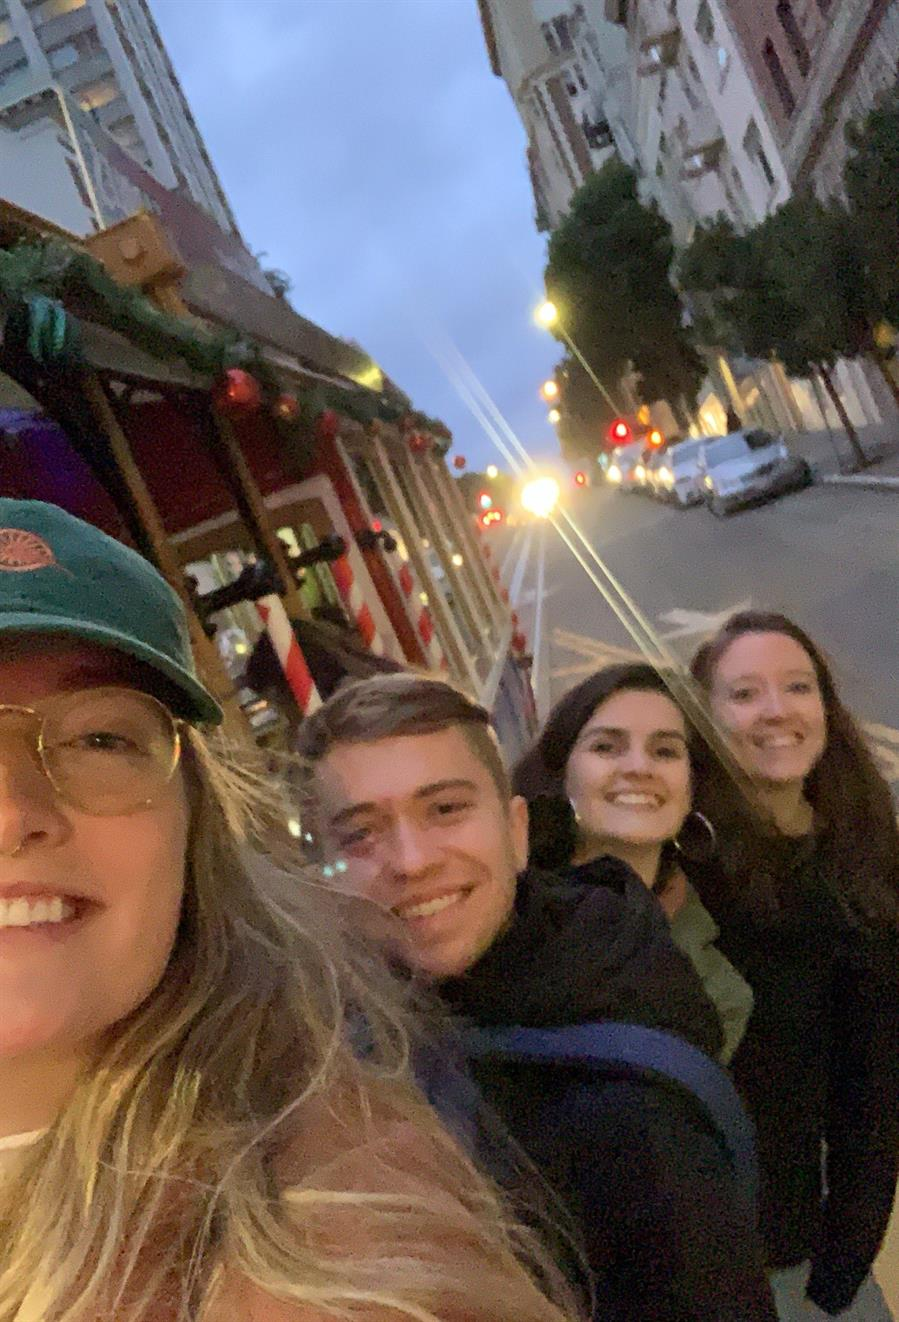 The 2019-2020 San Francisco, California MVS unit (L-R): Kristin Anton, Jacob Regier, Irena Xhari, and Leah Friesen. Photo by Kristin Anton.